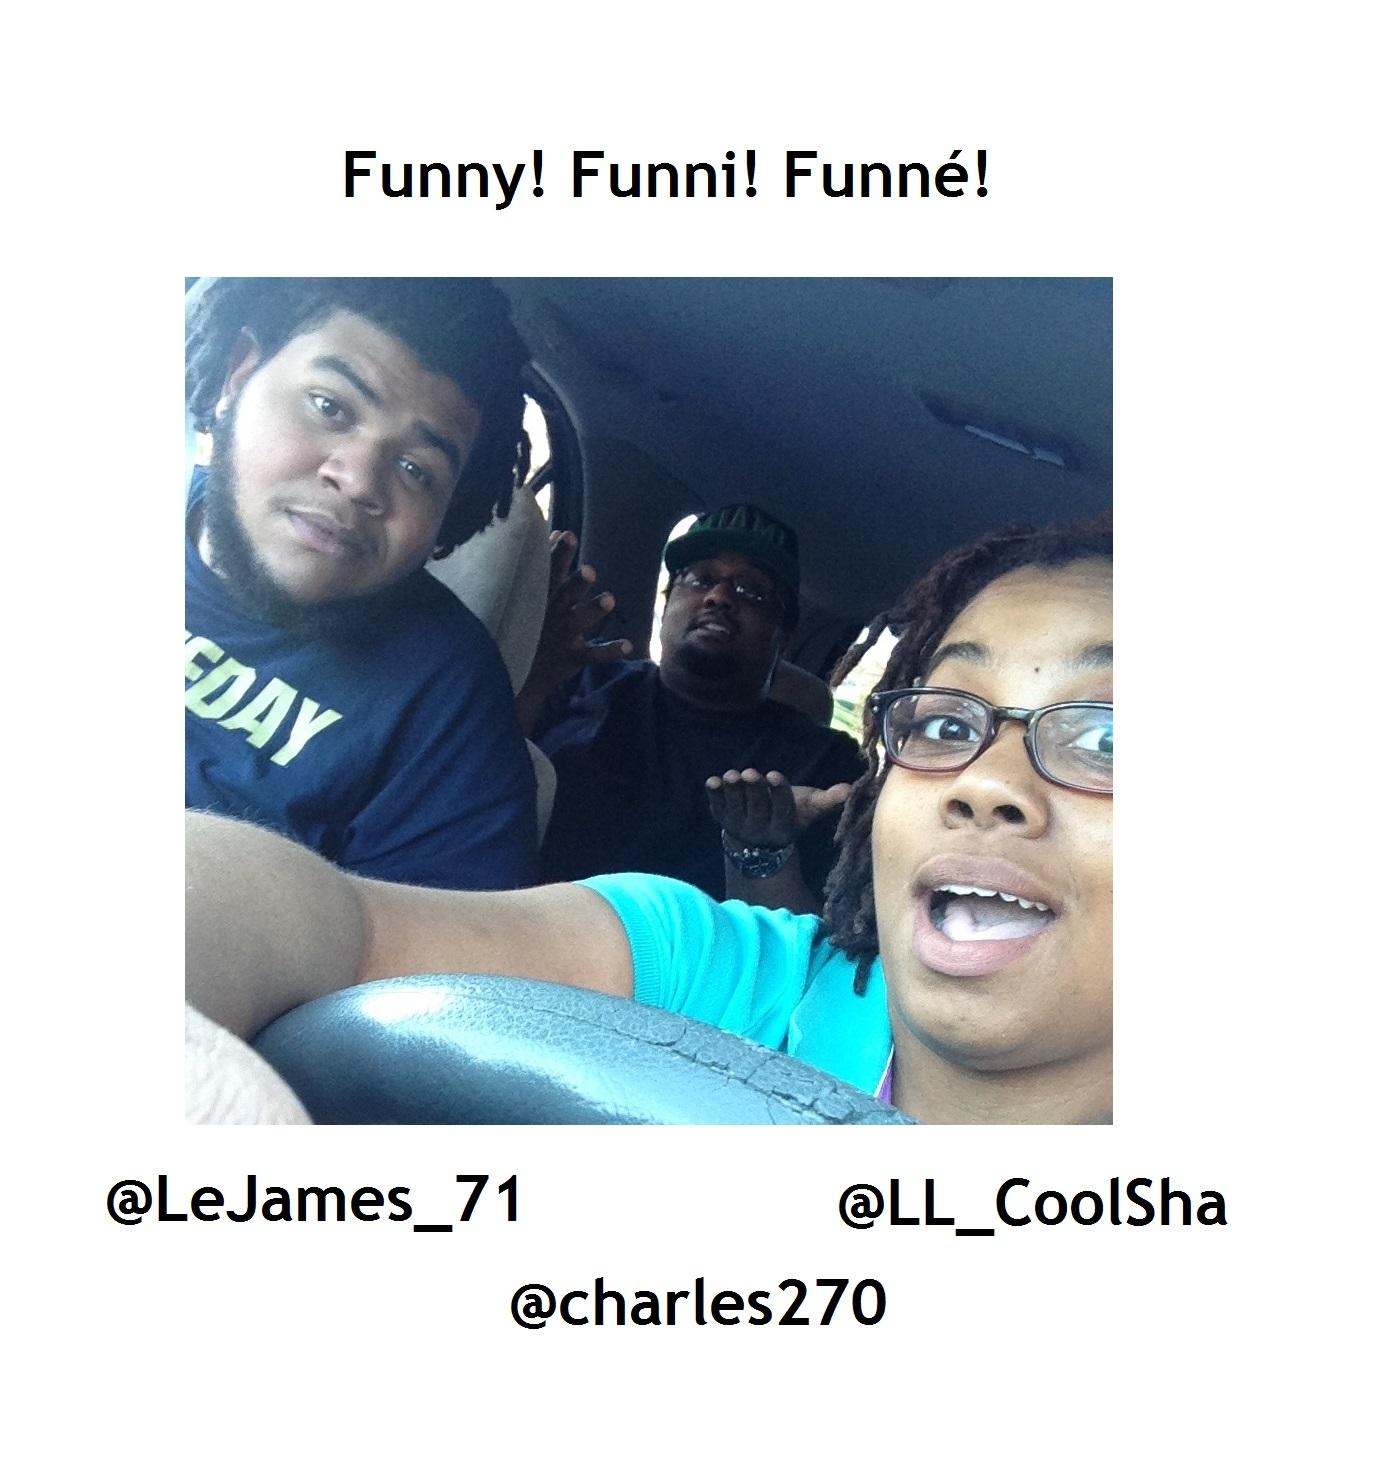 Funny! Funni! Funné!